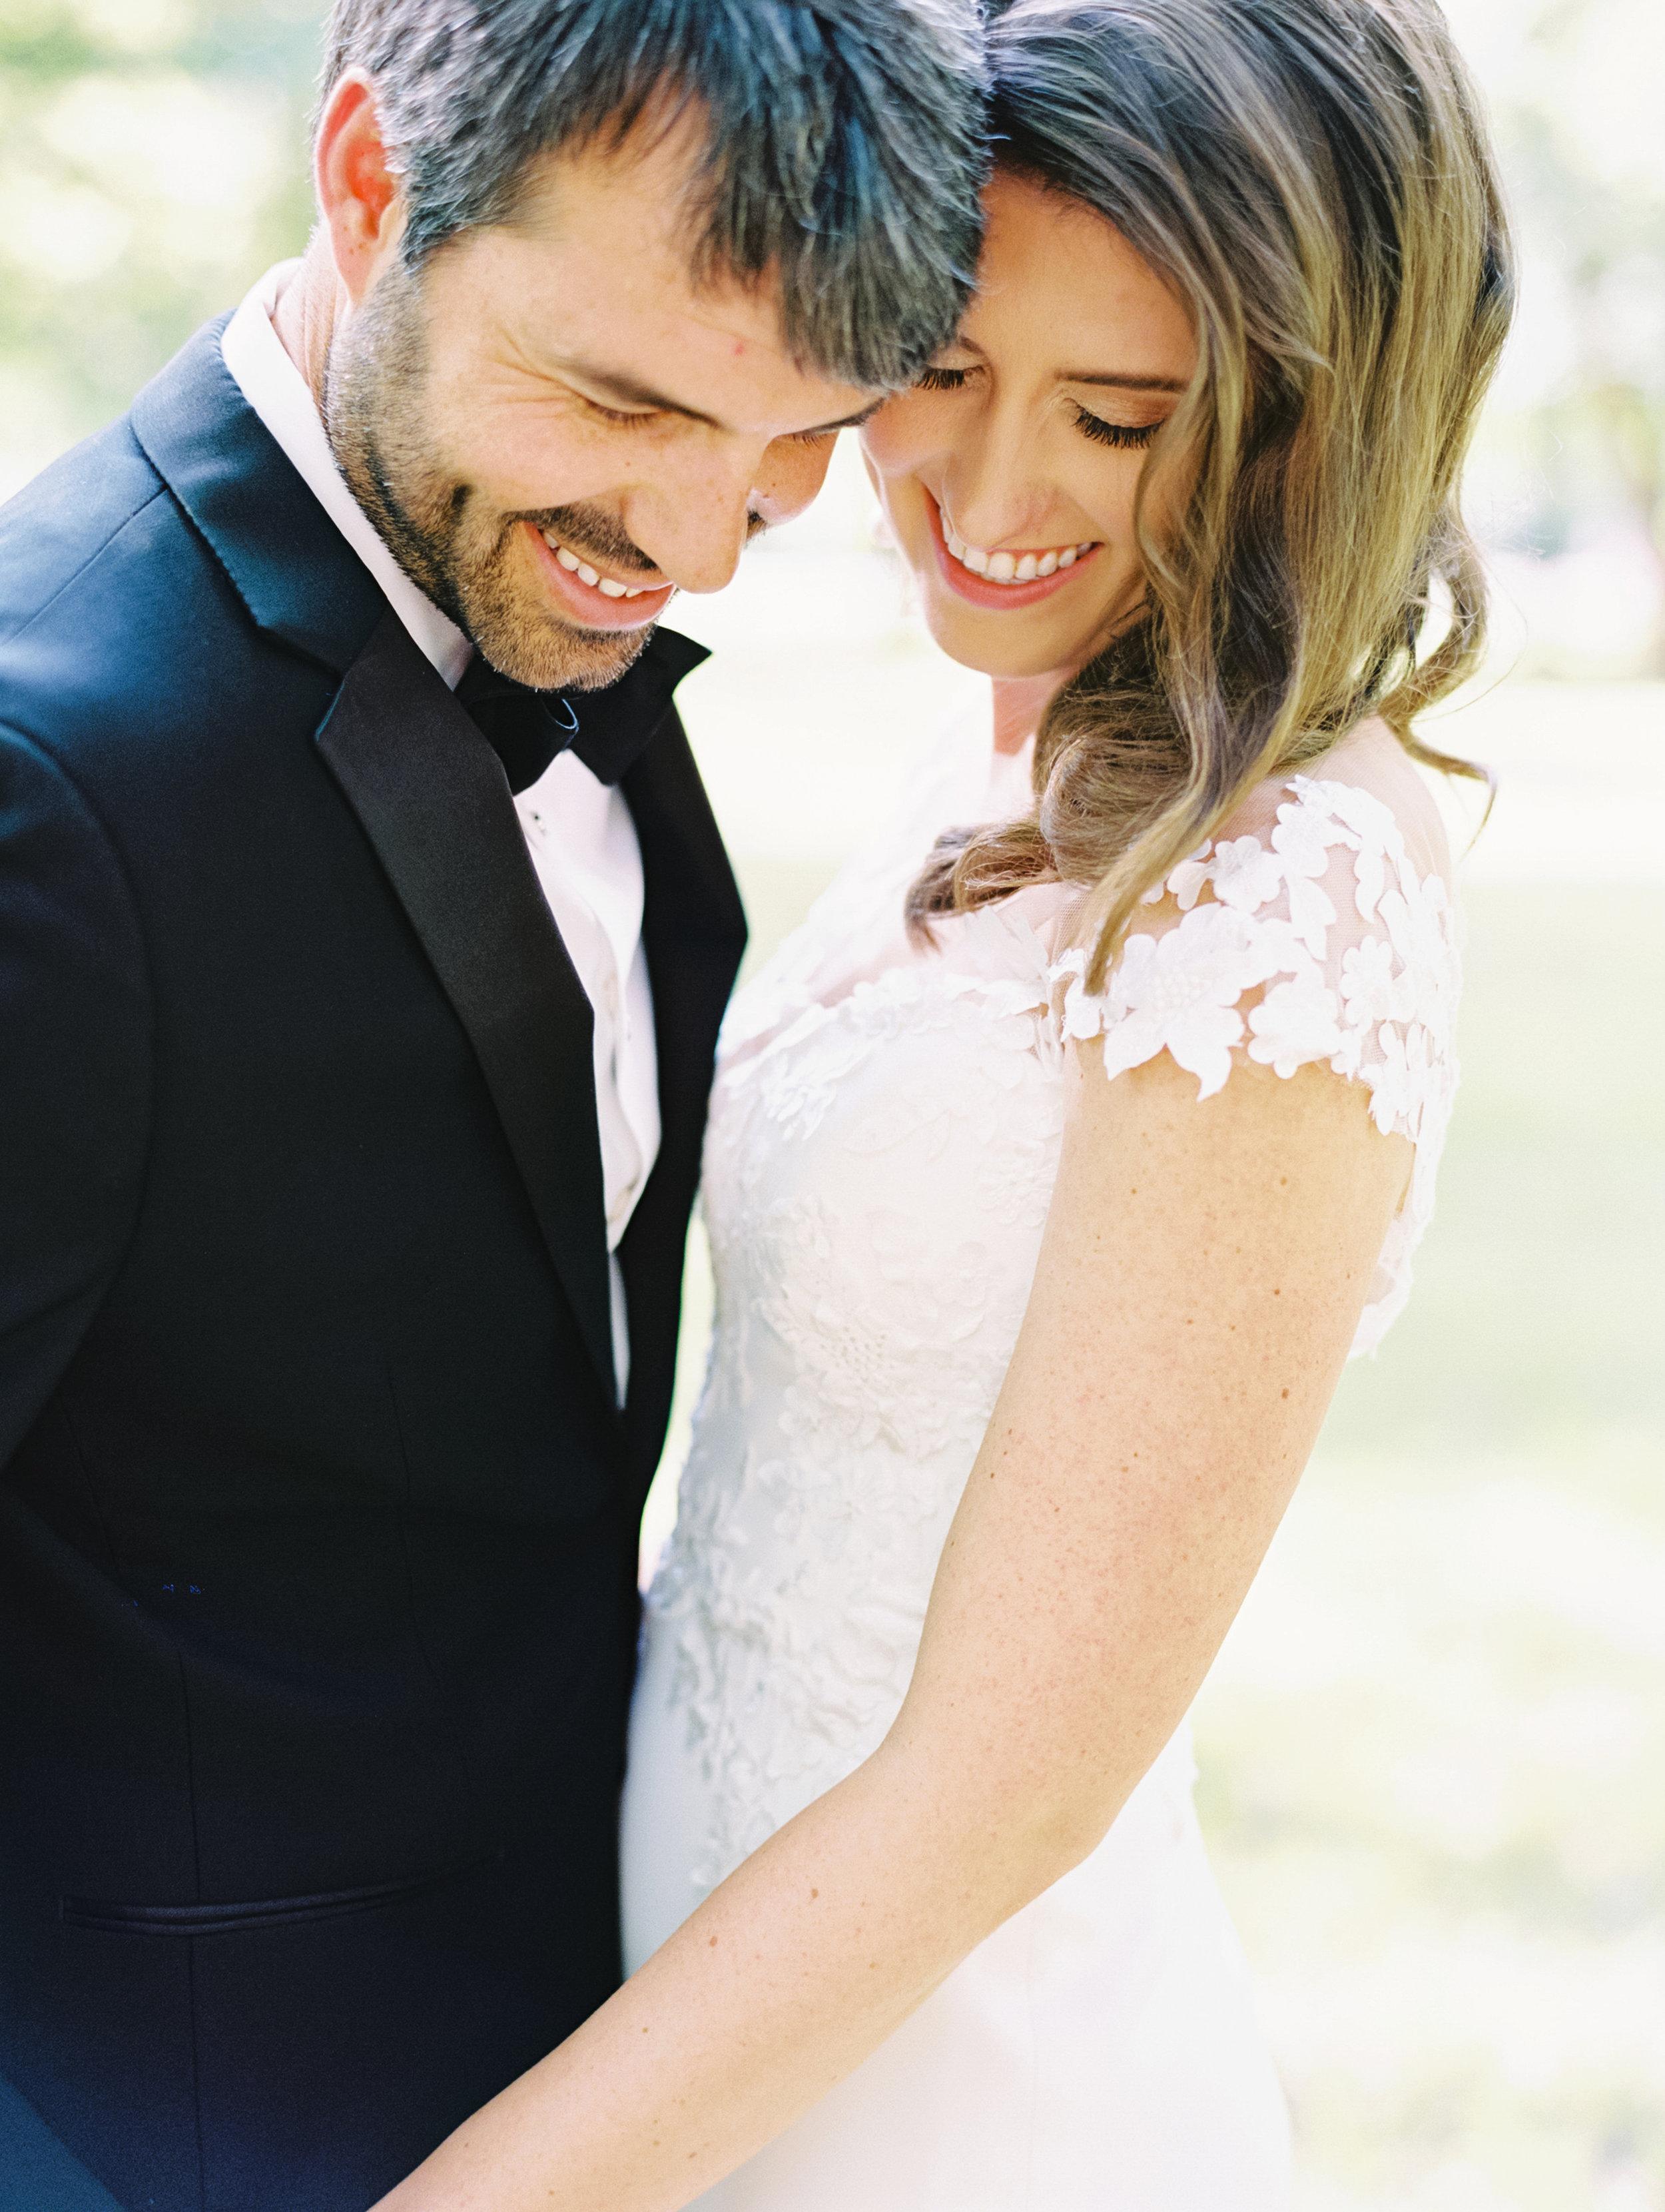 Fort Worth Zoo Wedding - Lindsey Brunk